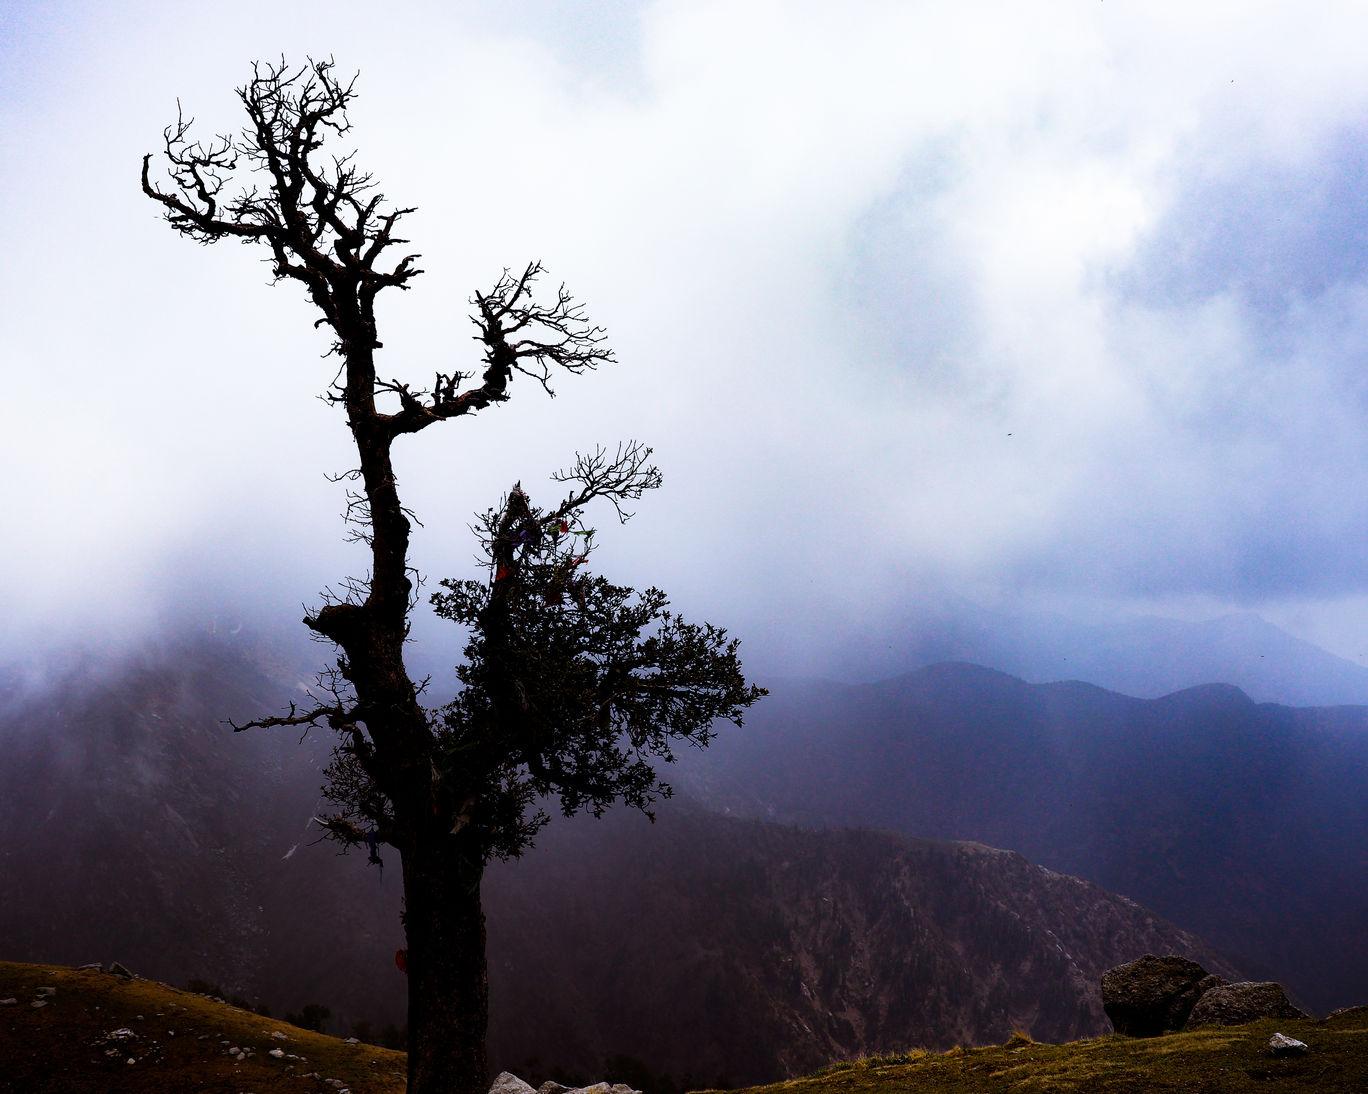 Photo of Triund Trek By Sunny Thakur